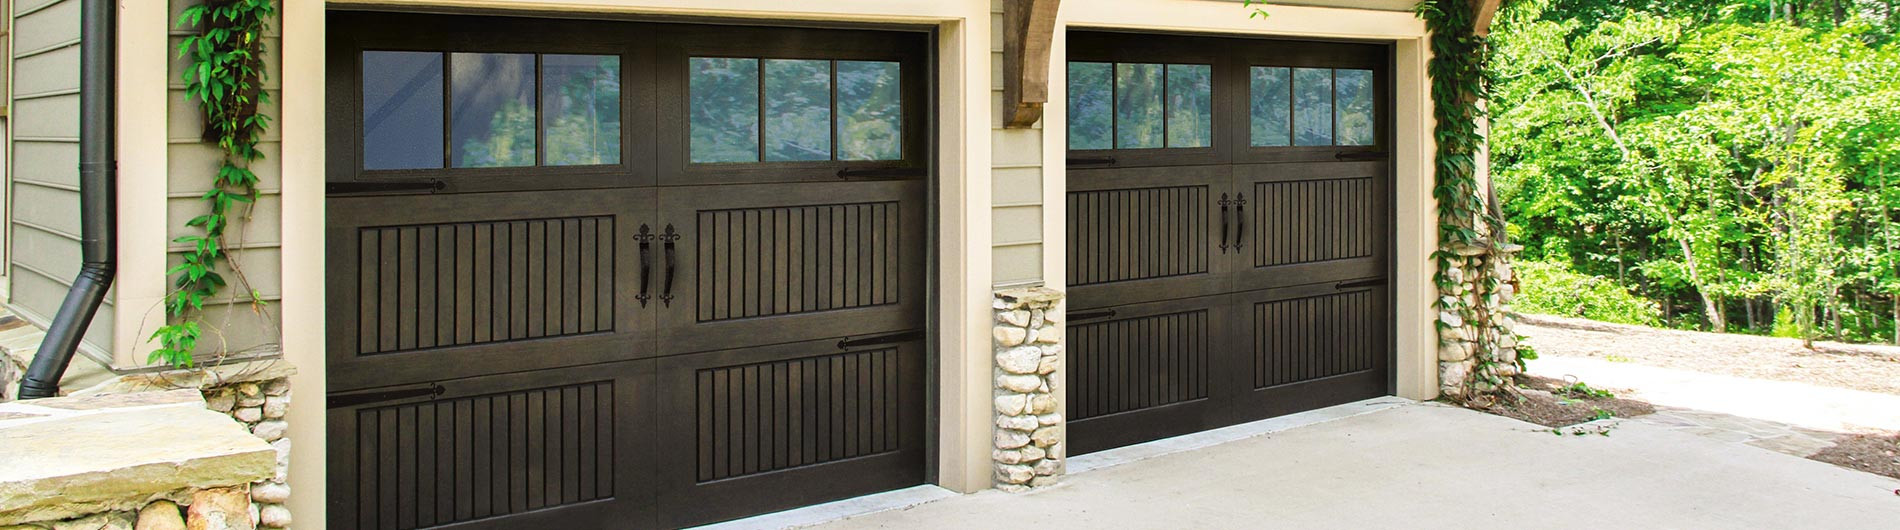 9800-Fiberglass-Garage-Door-Sonoma-Walnu